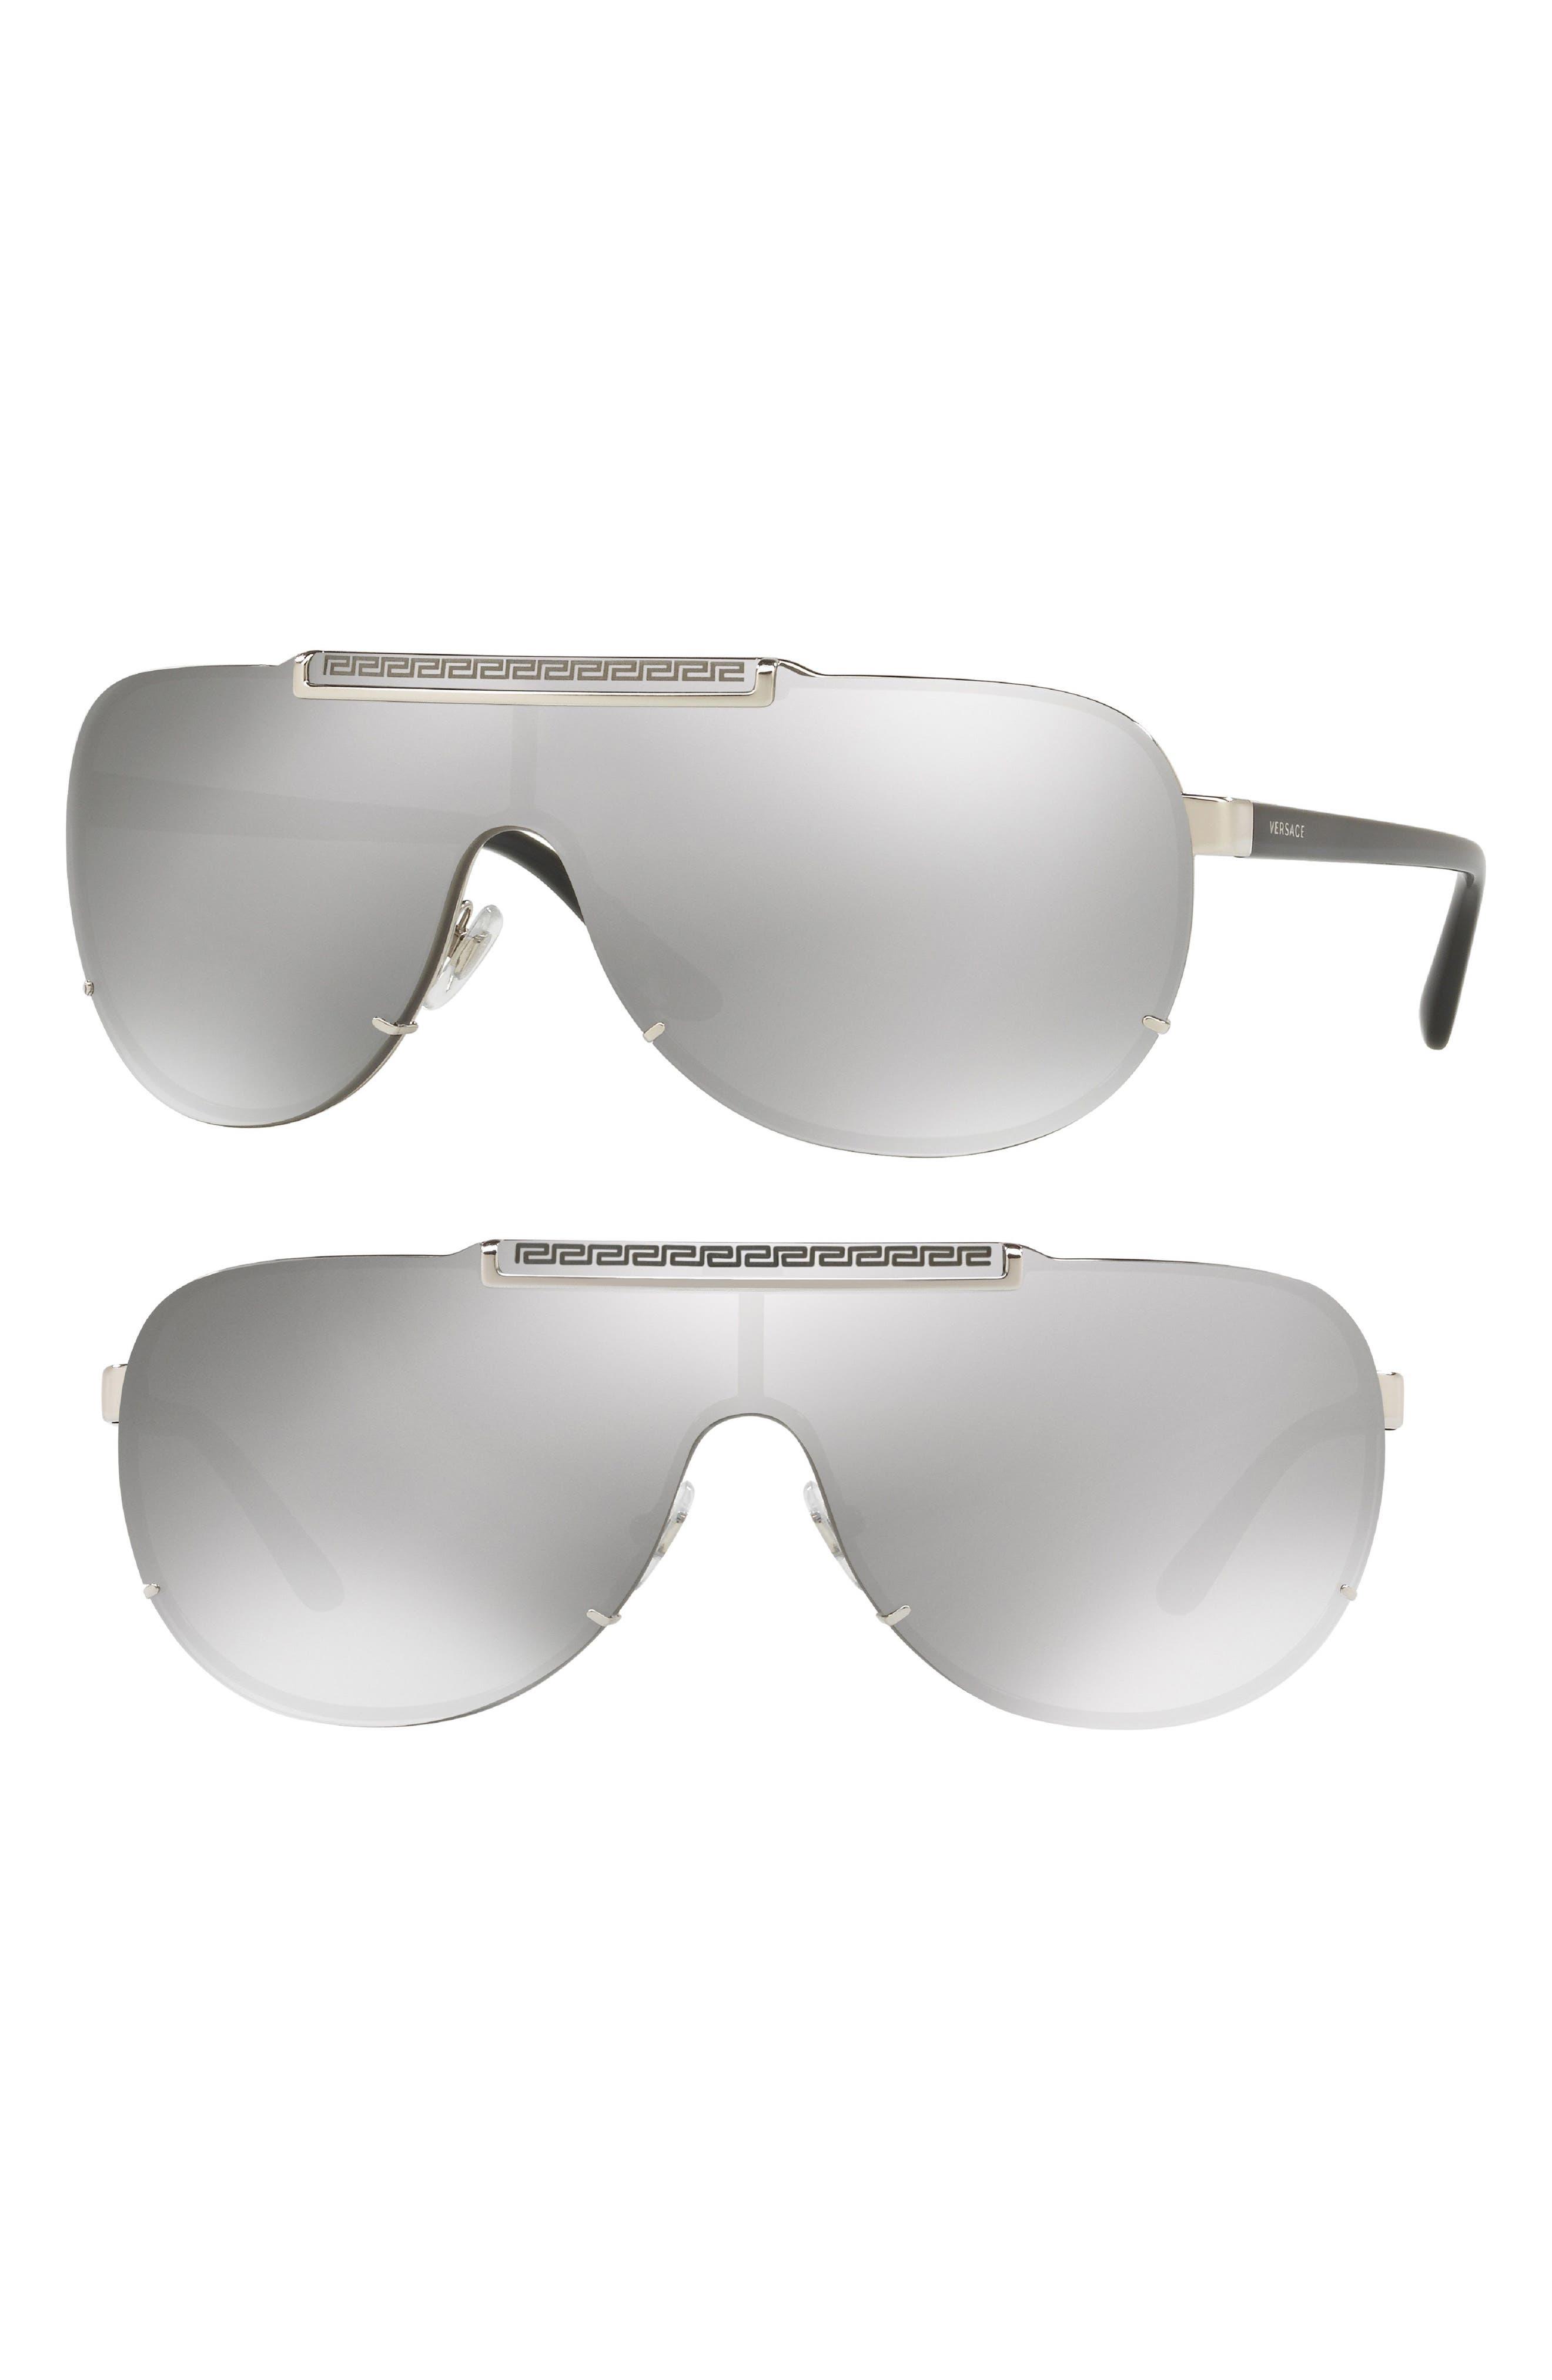 40mm Shield Sunglasses,                             Main thumbnail 1, color,